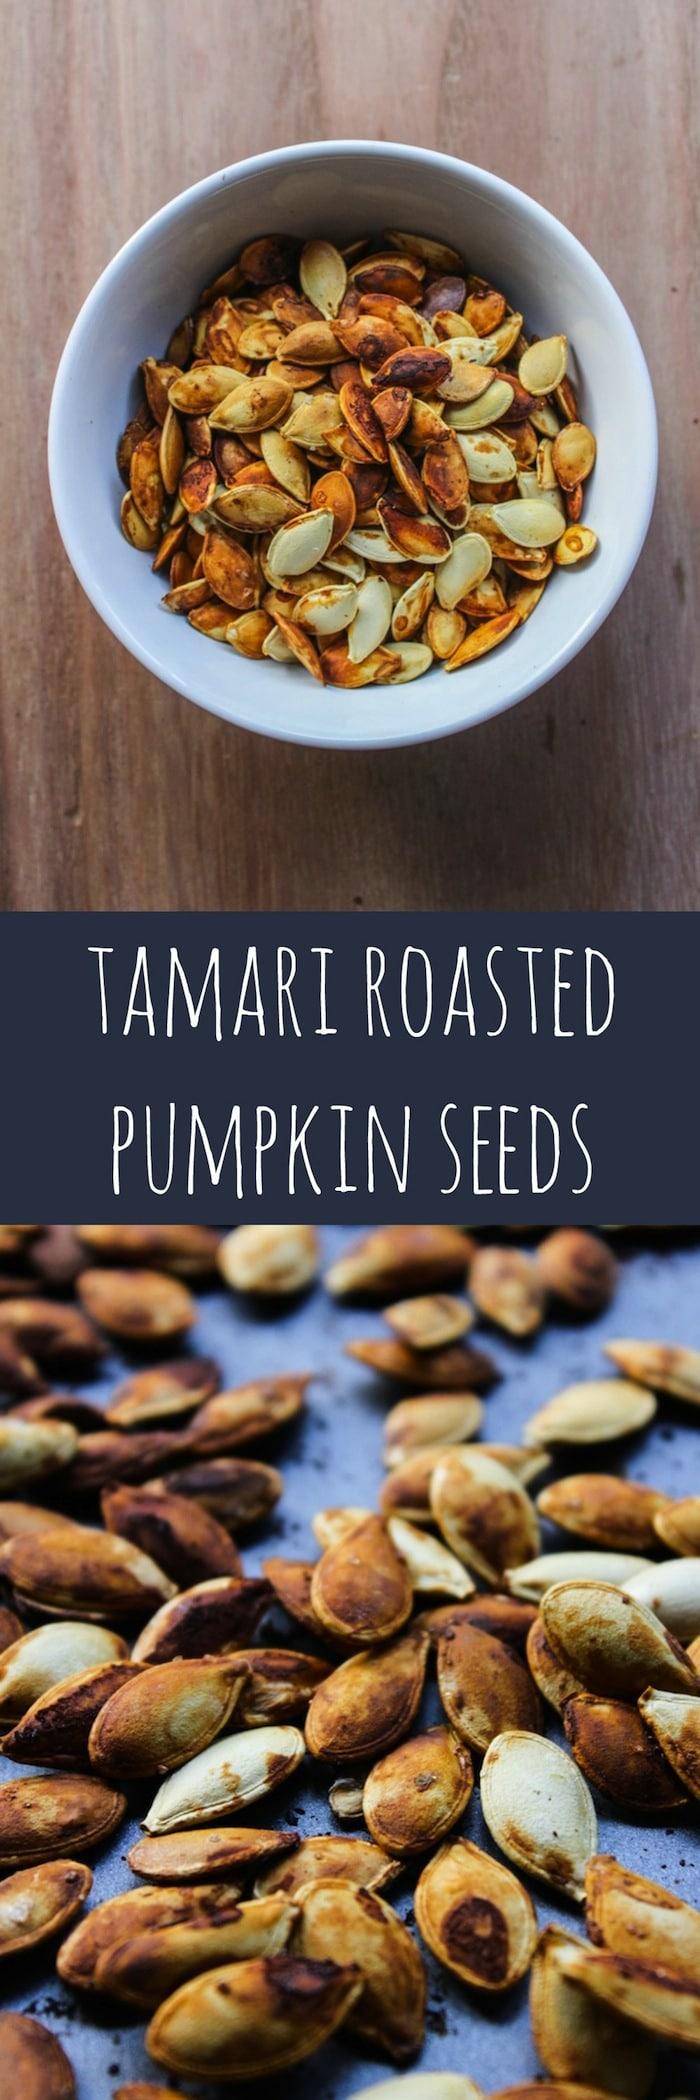 Tamari Roasted Pumpkin Seeds: Don't throw away those pumpkin seeds! Season, roast, and enjoy